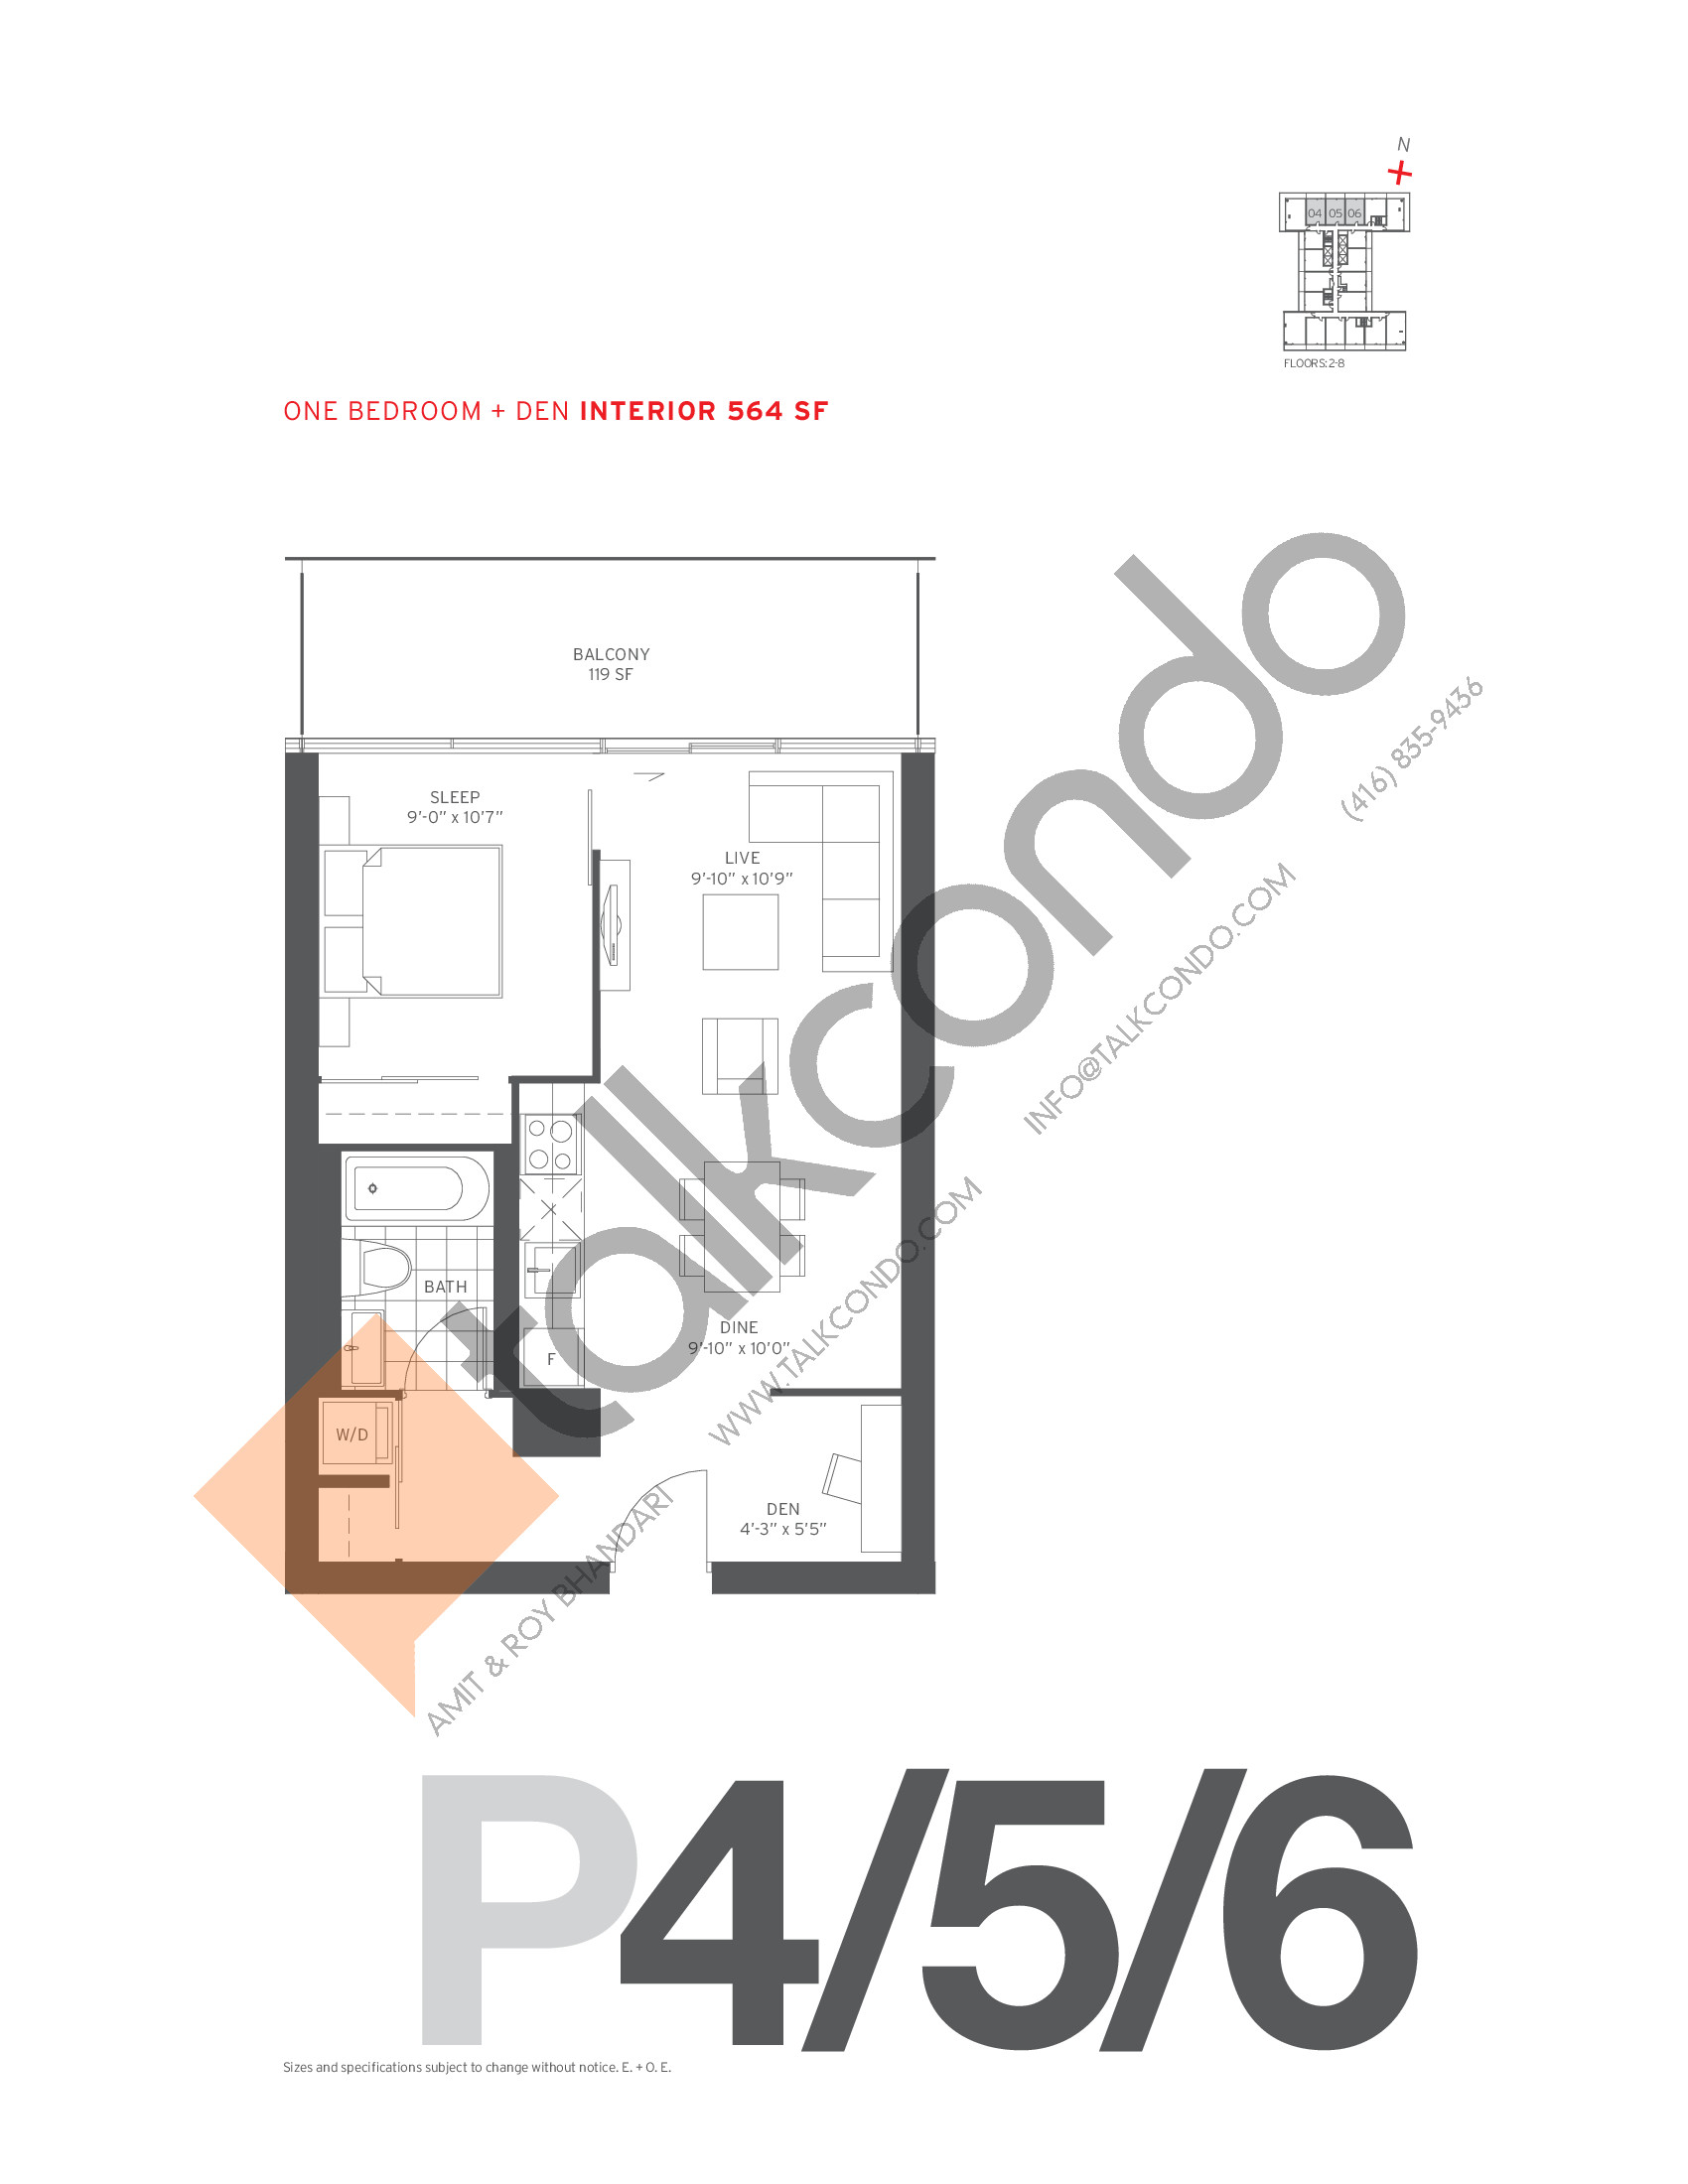 P4/5/6 Floor Plan at 155 Redpath Condos - 564 sq.ft